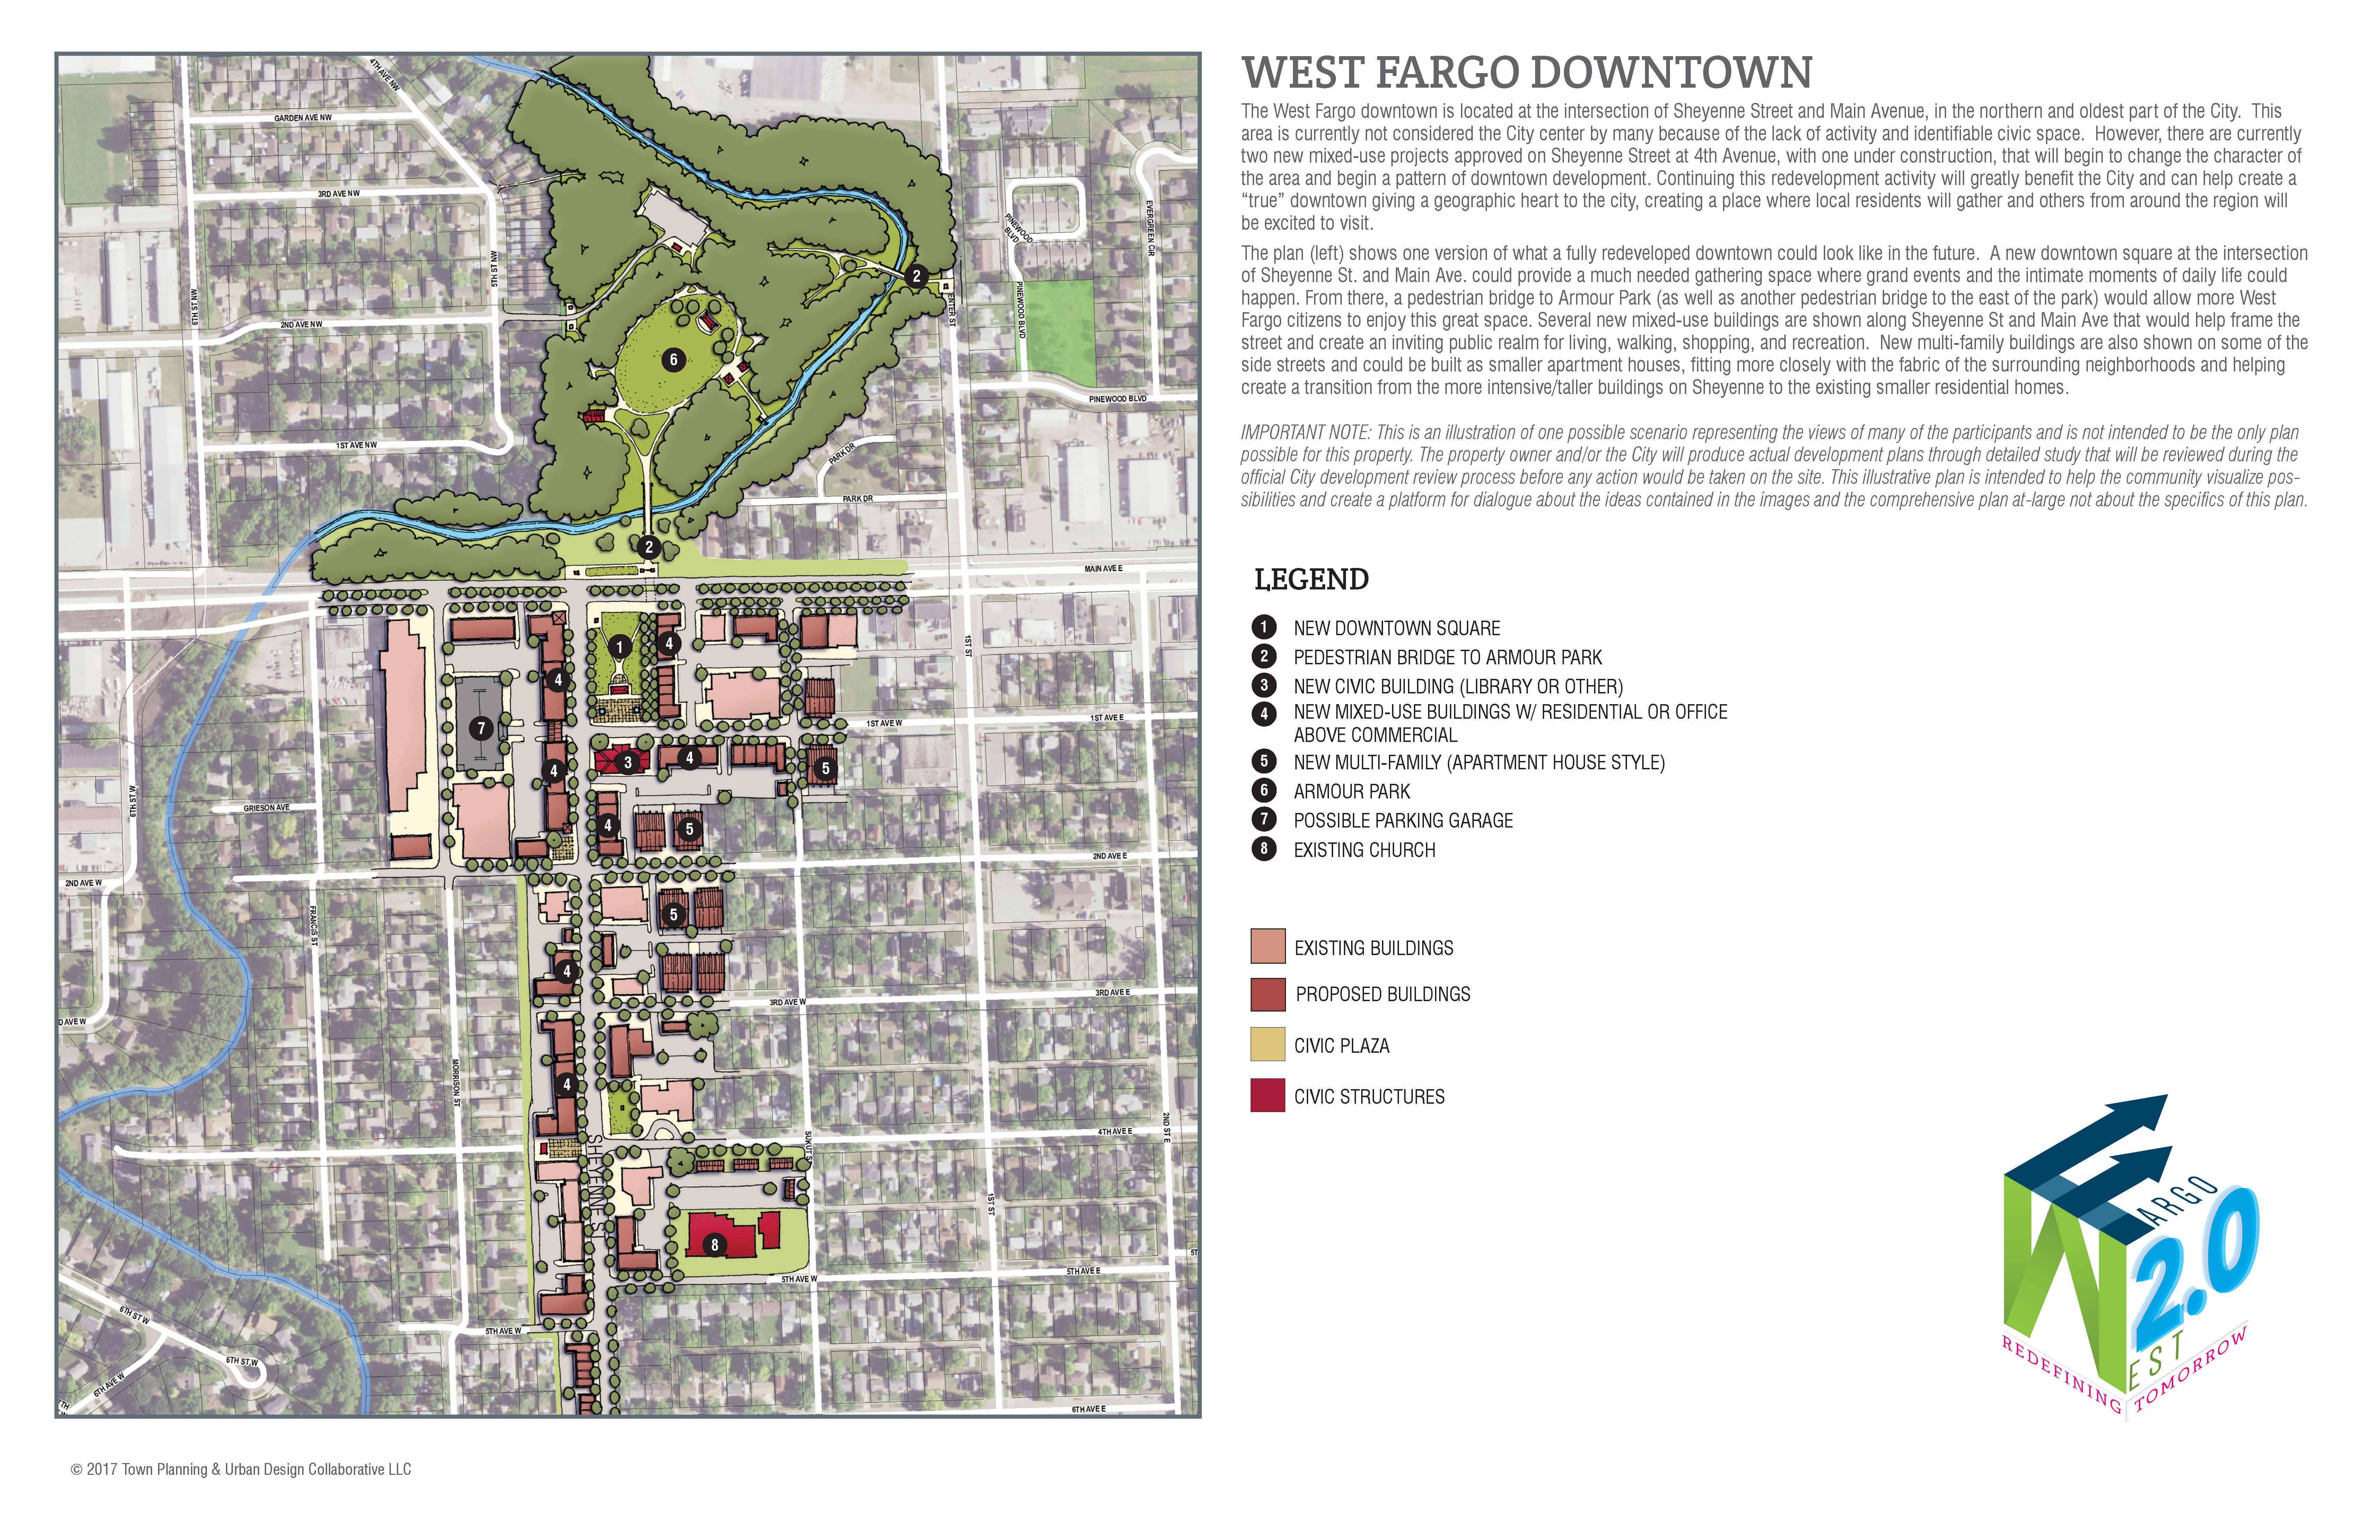 Planapalooza West Fargo 20